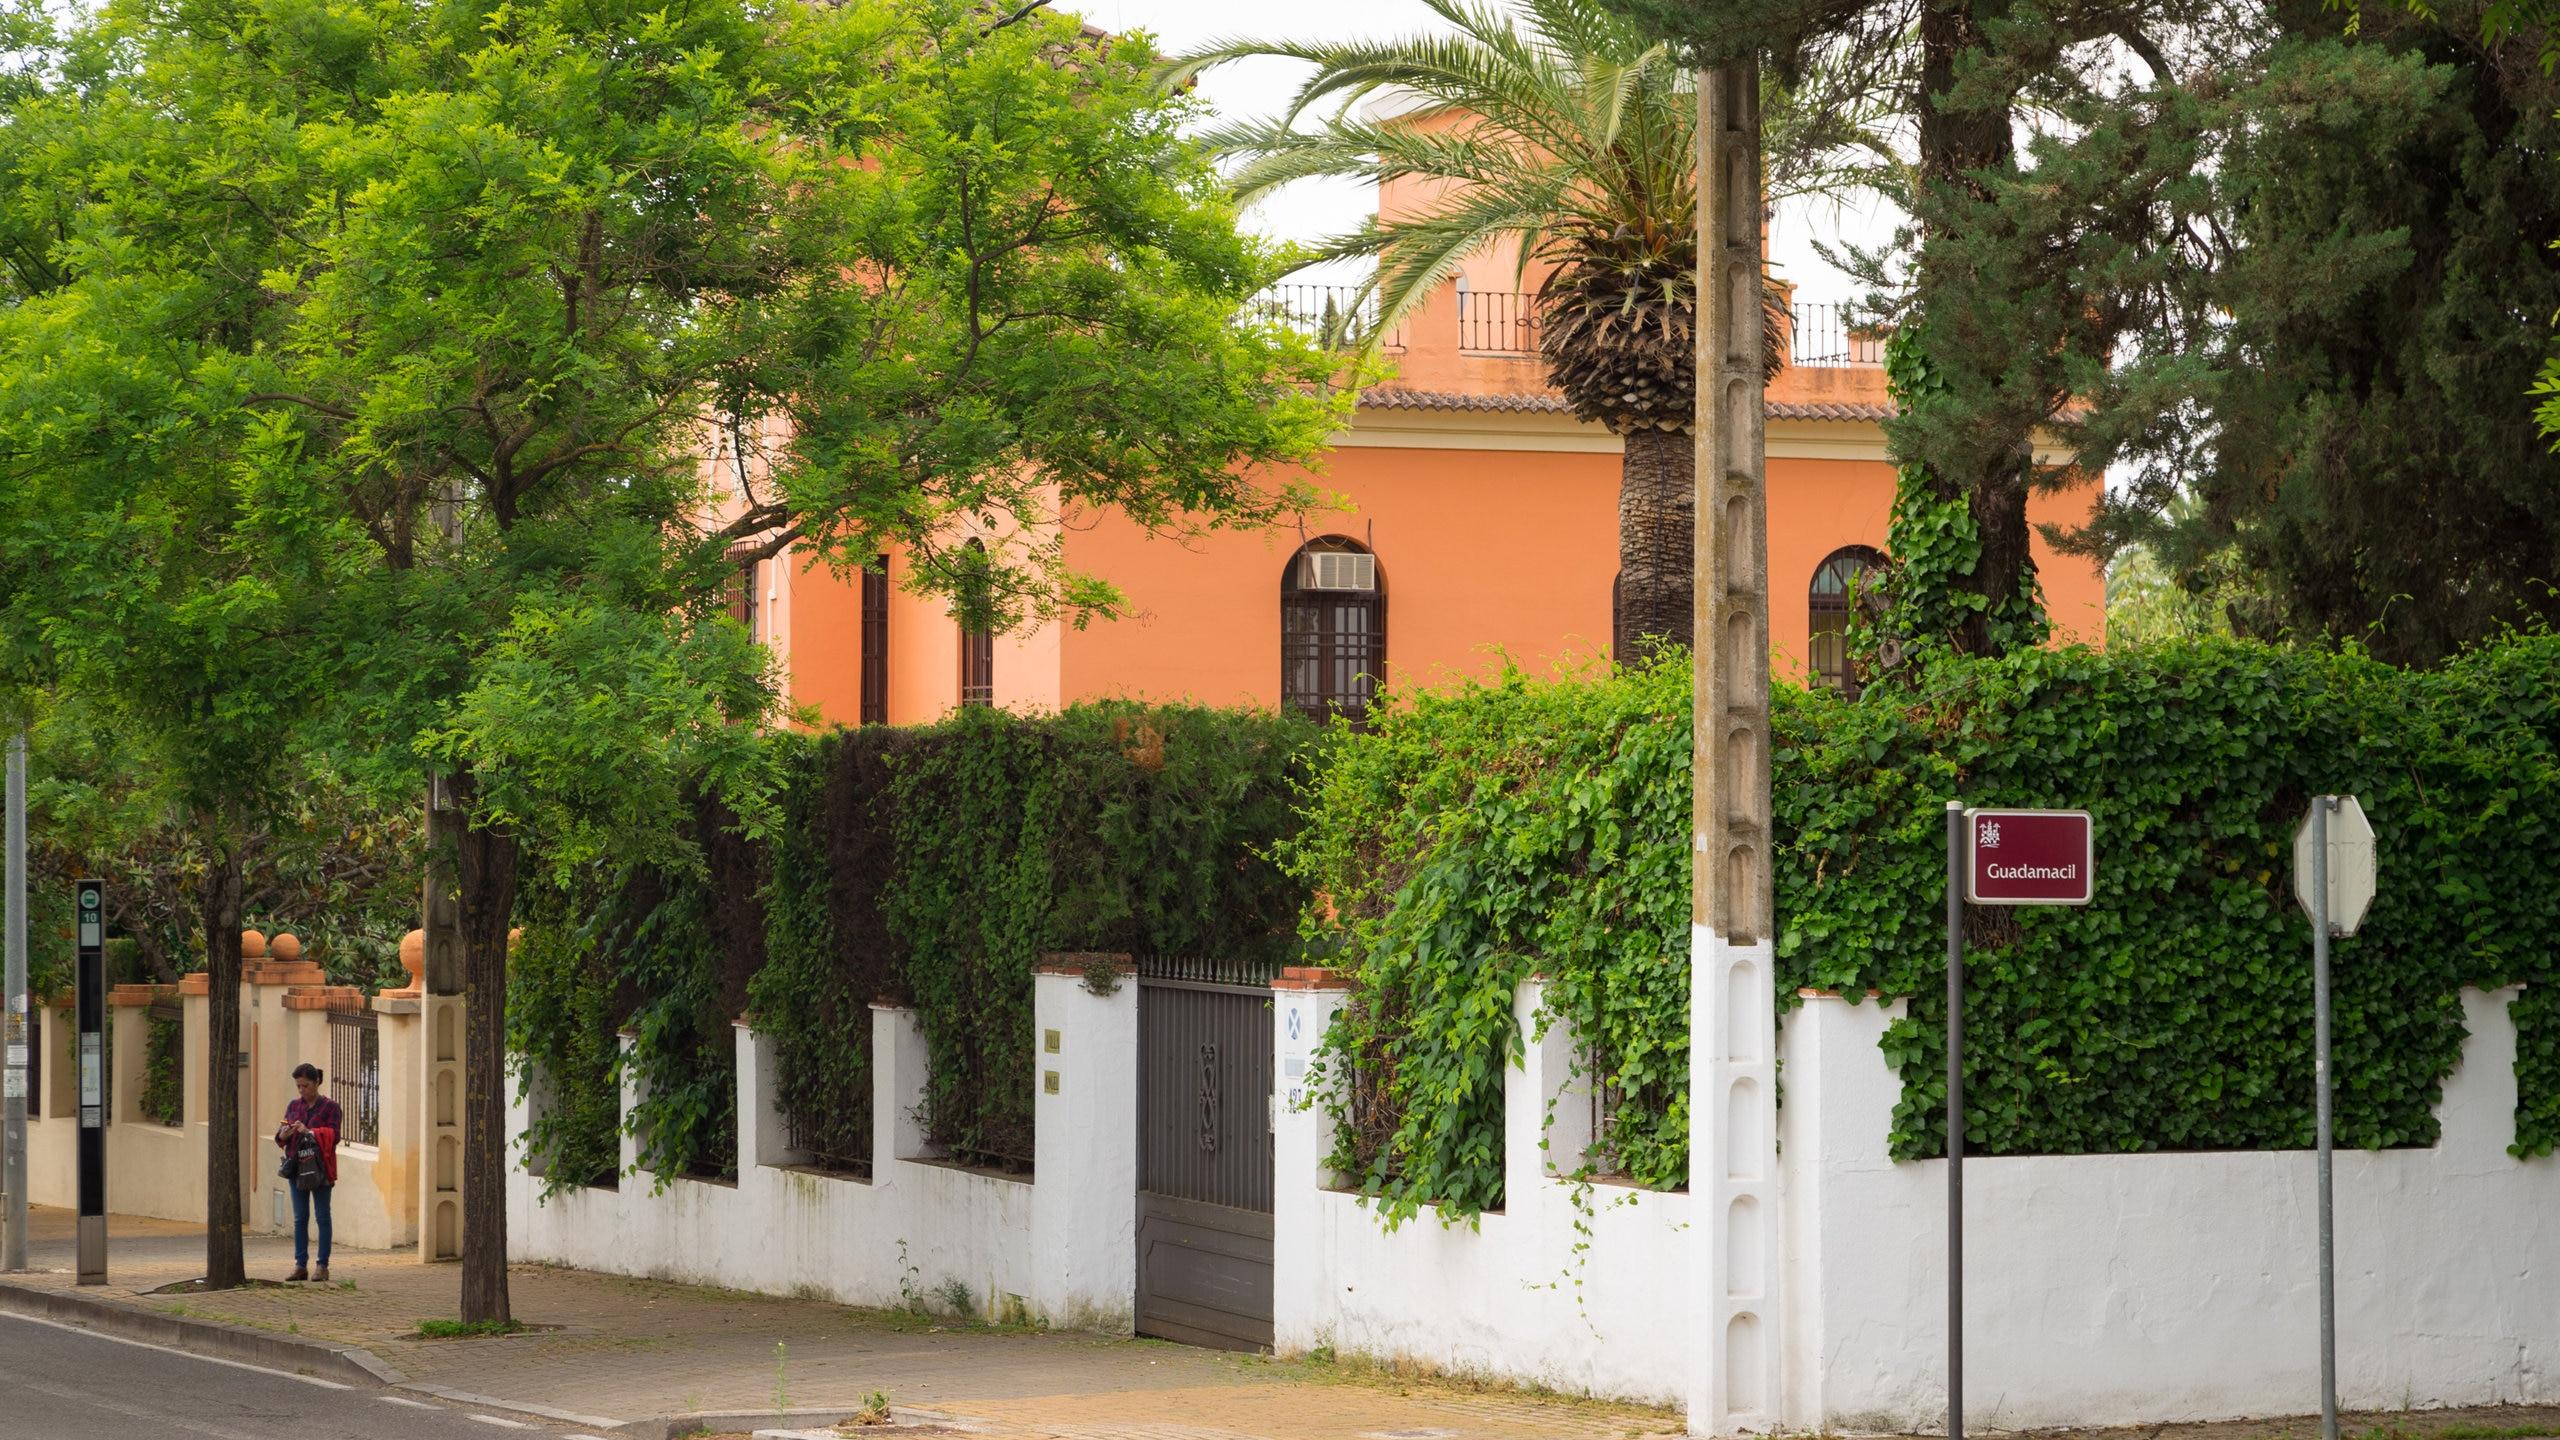 El Brillante, Córdoba, Andalusia, Spain